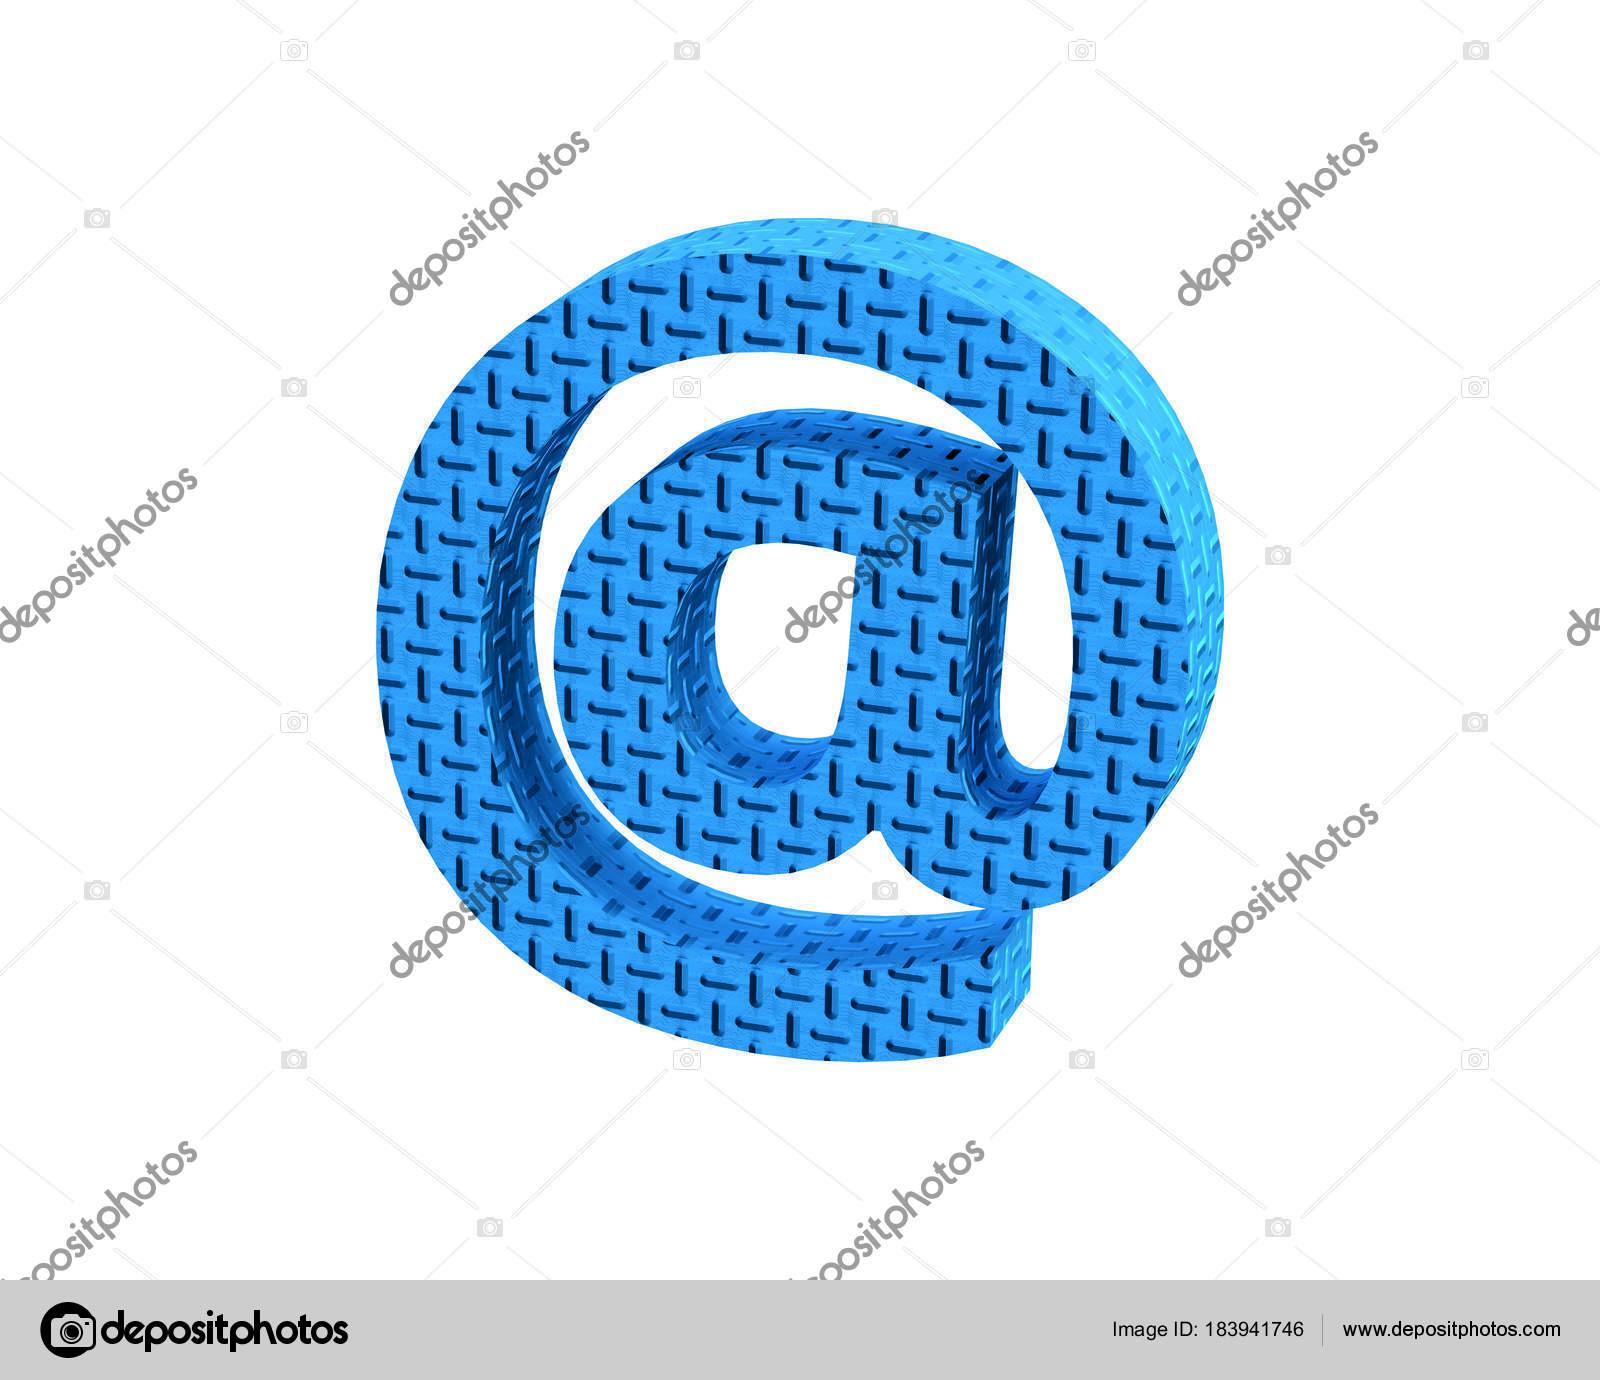 3D rendering Font Plastic blue treadplate special character ALT64 u2014 Photo by dhz-ontwerpen@hotmail.com  sc 1 st  Depositphotos & Font Plastic blue treadplate special character ALT64 render u2014 Stock ...